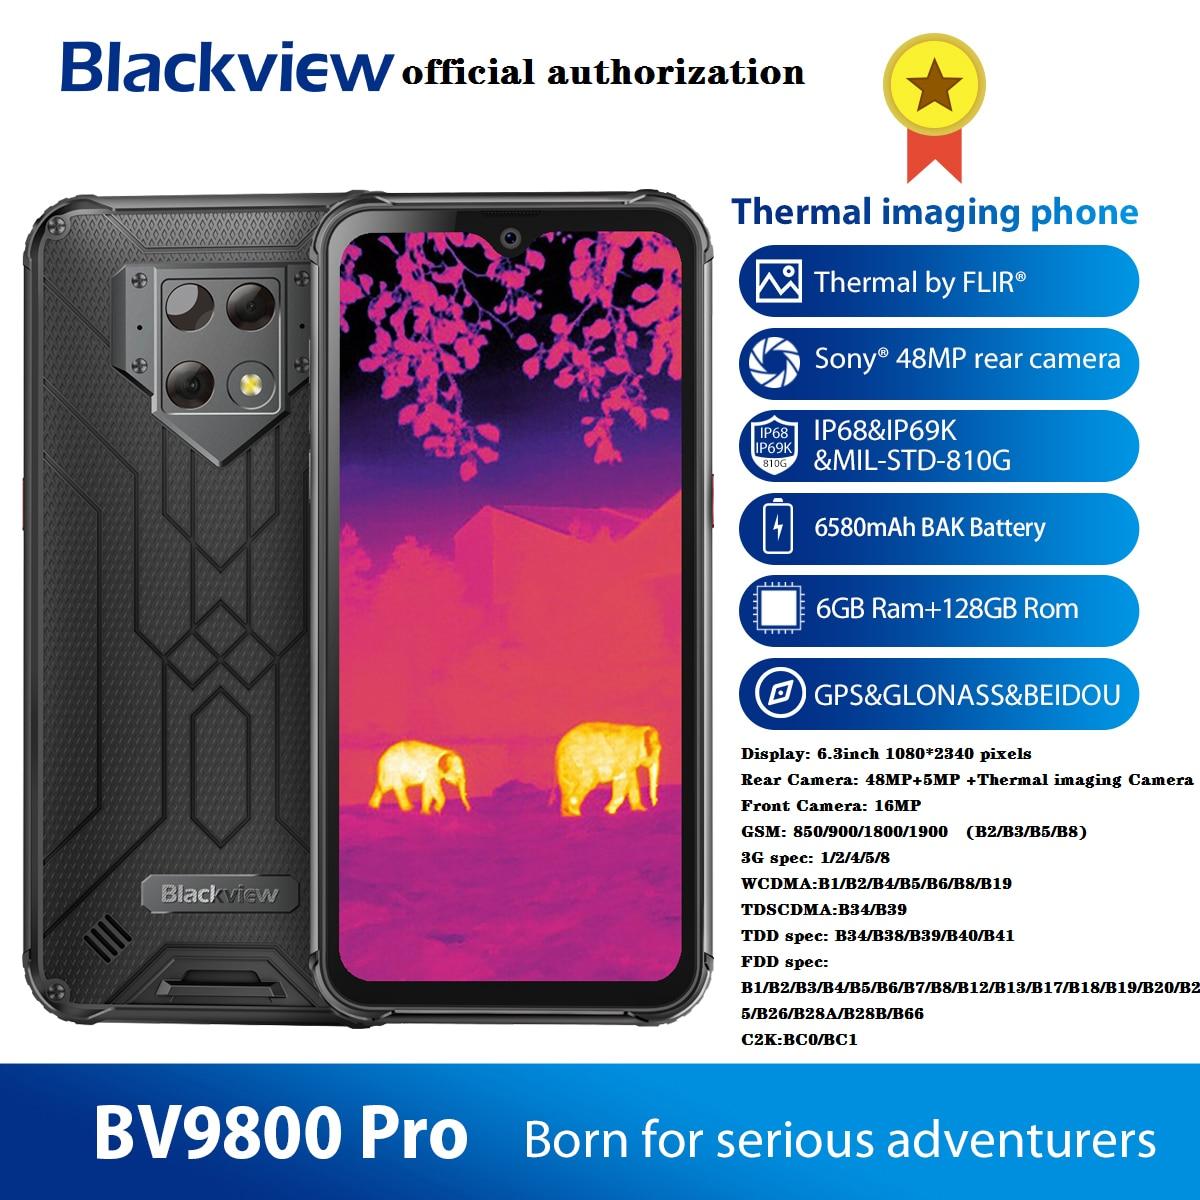 Blackview BV9800 Pro Thermal Camera Smart Phone Helio P70 Android 9.0 6GB+128GB IP68 Waterproof 6580mAh Rugged Smartphone